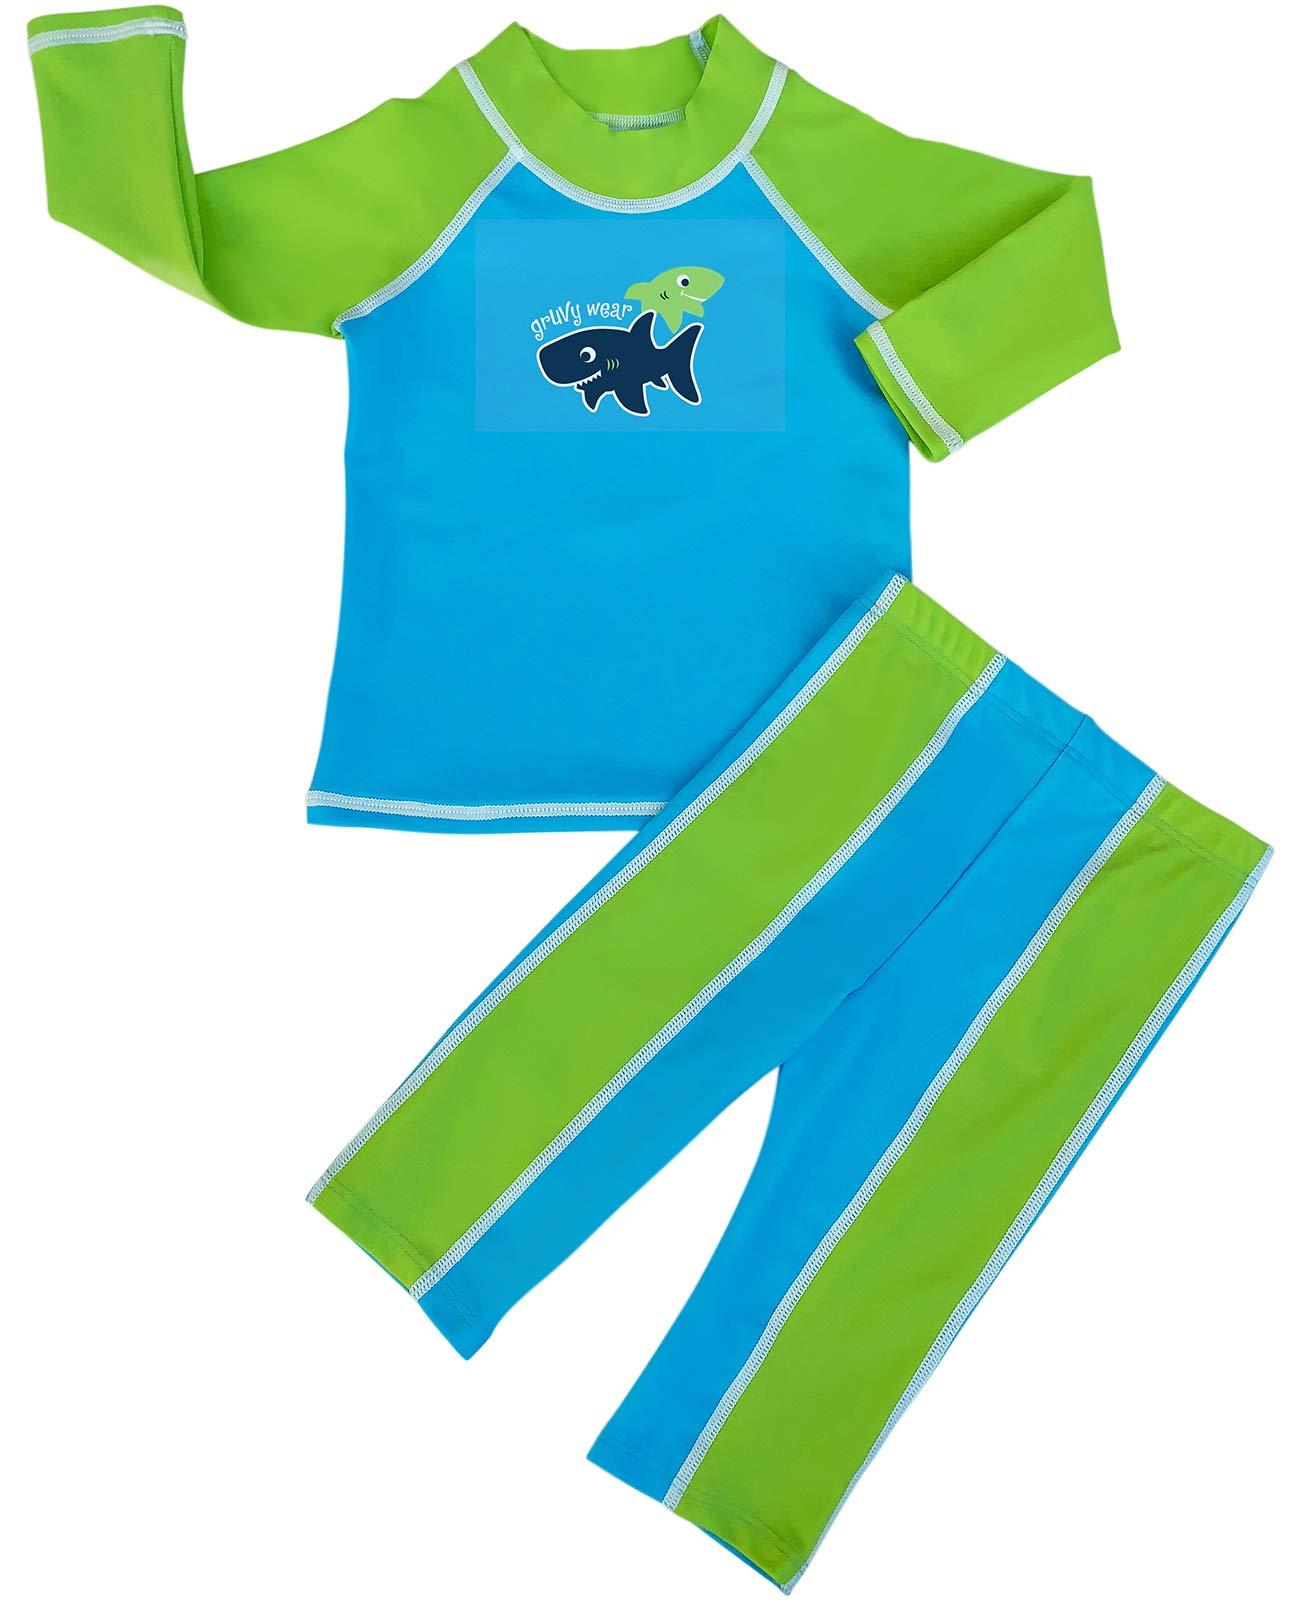 grUVywear Baby | Toddler Boys Rash Guard Long Sleeve Swimsuit Set 2 Piece UPF 50 - Shark Sighting | 12-18 Months by grUVywear